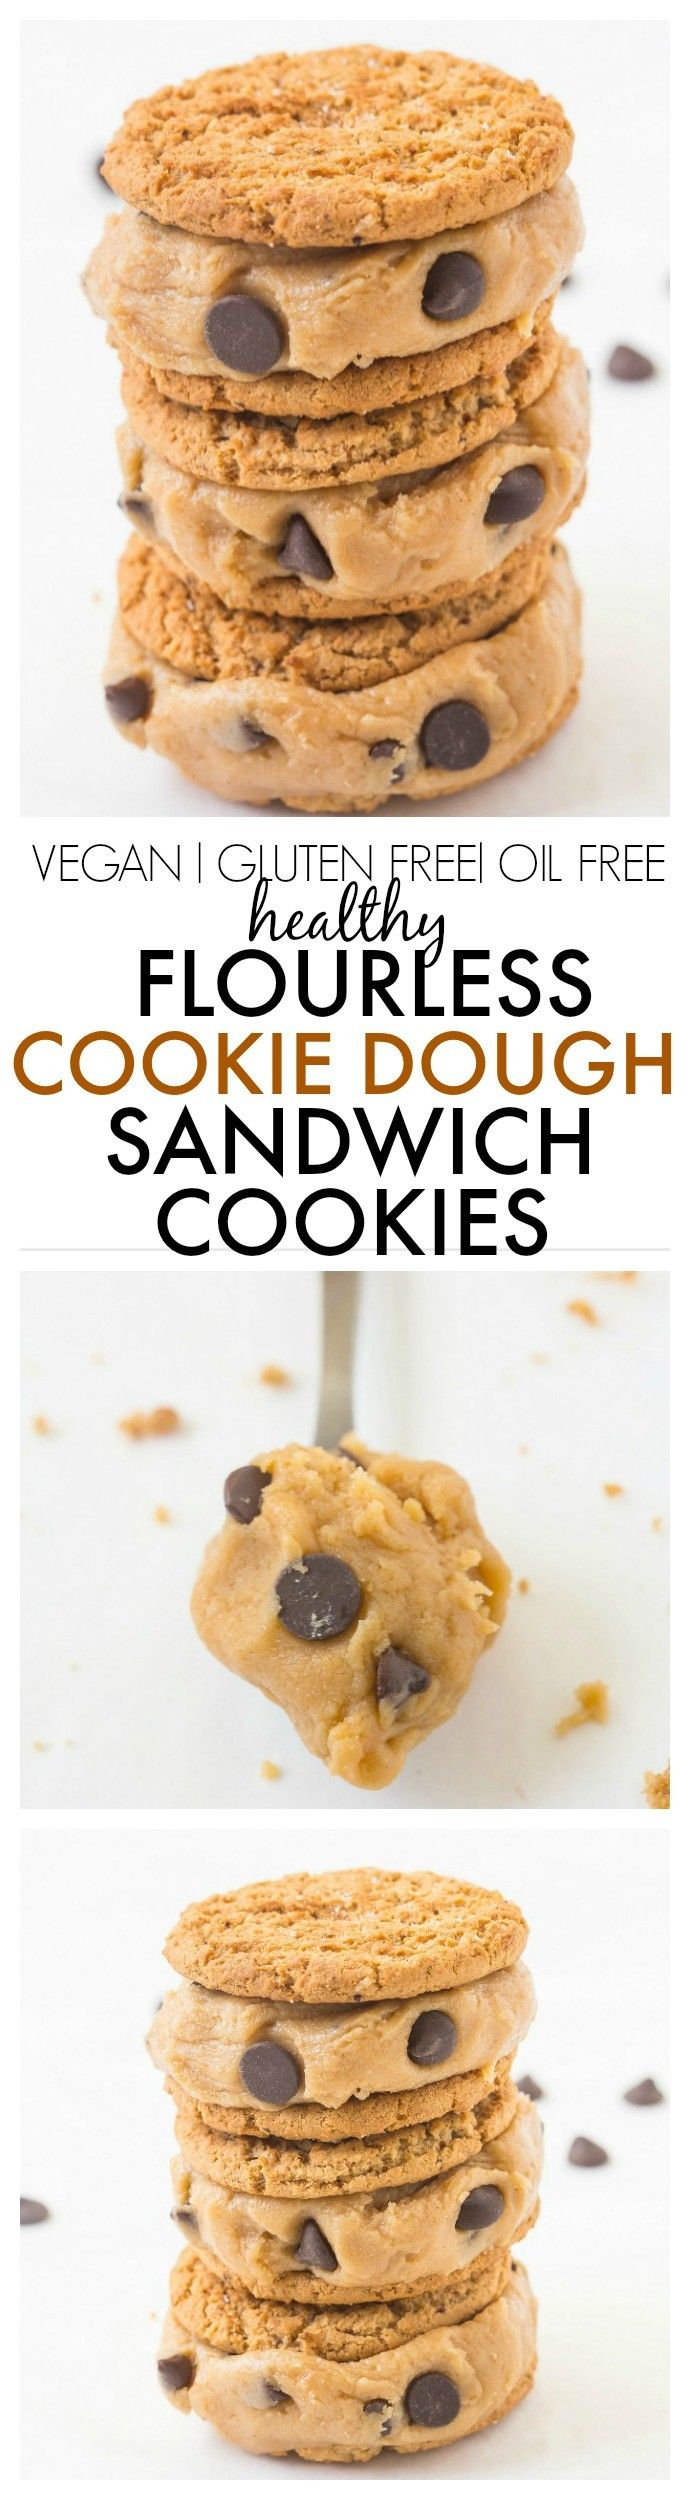 Easy cookie dough recipe no butter